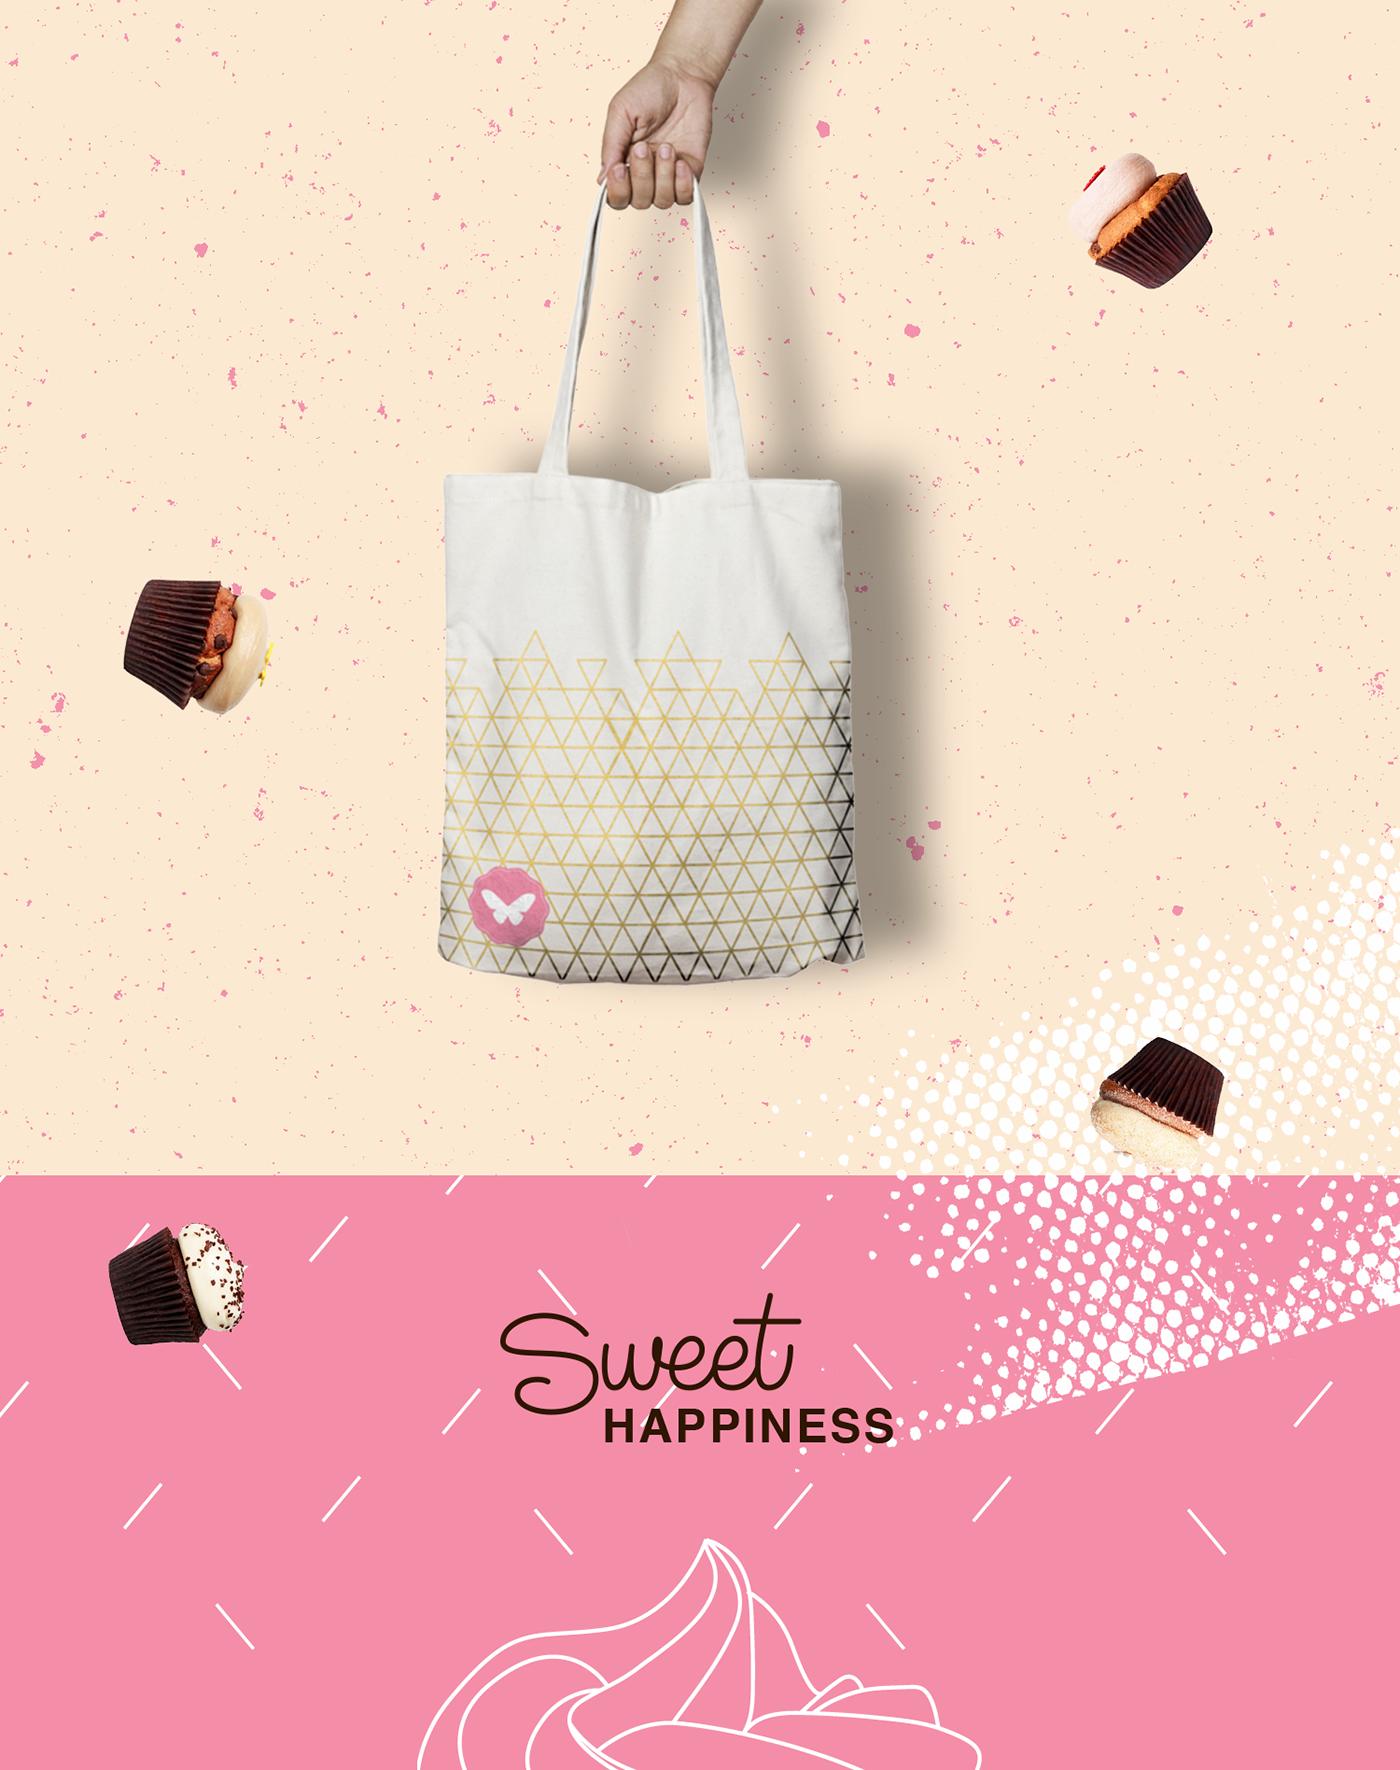 branding  bakery cupcakes sweet happiness pink csun viscom design